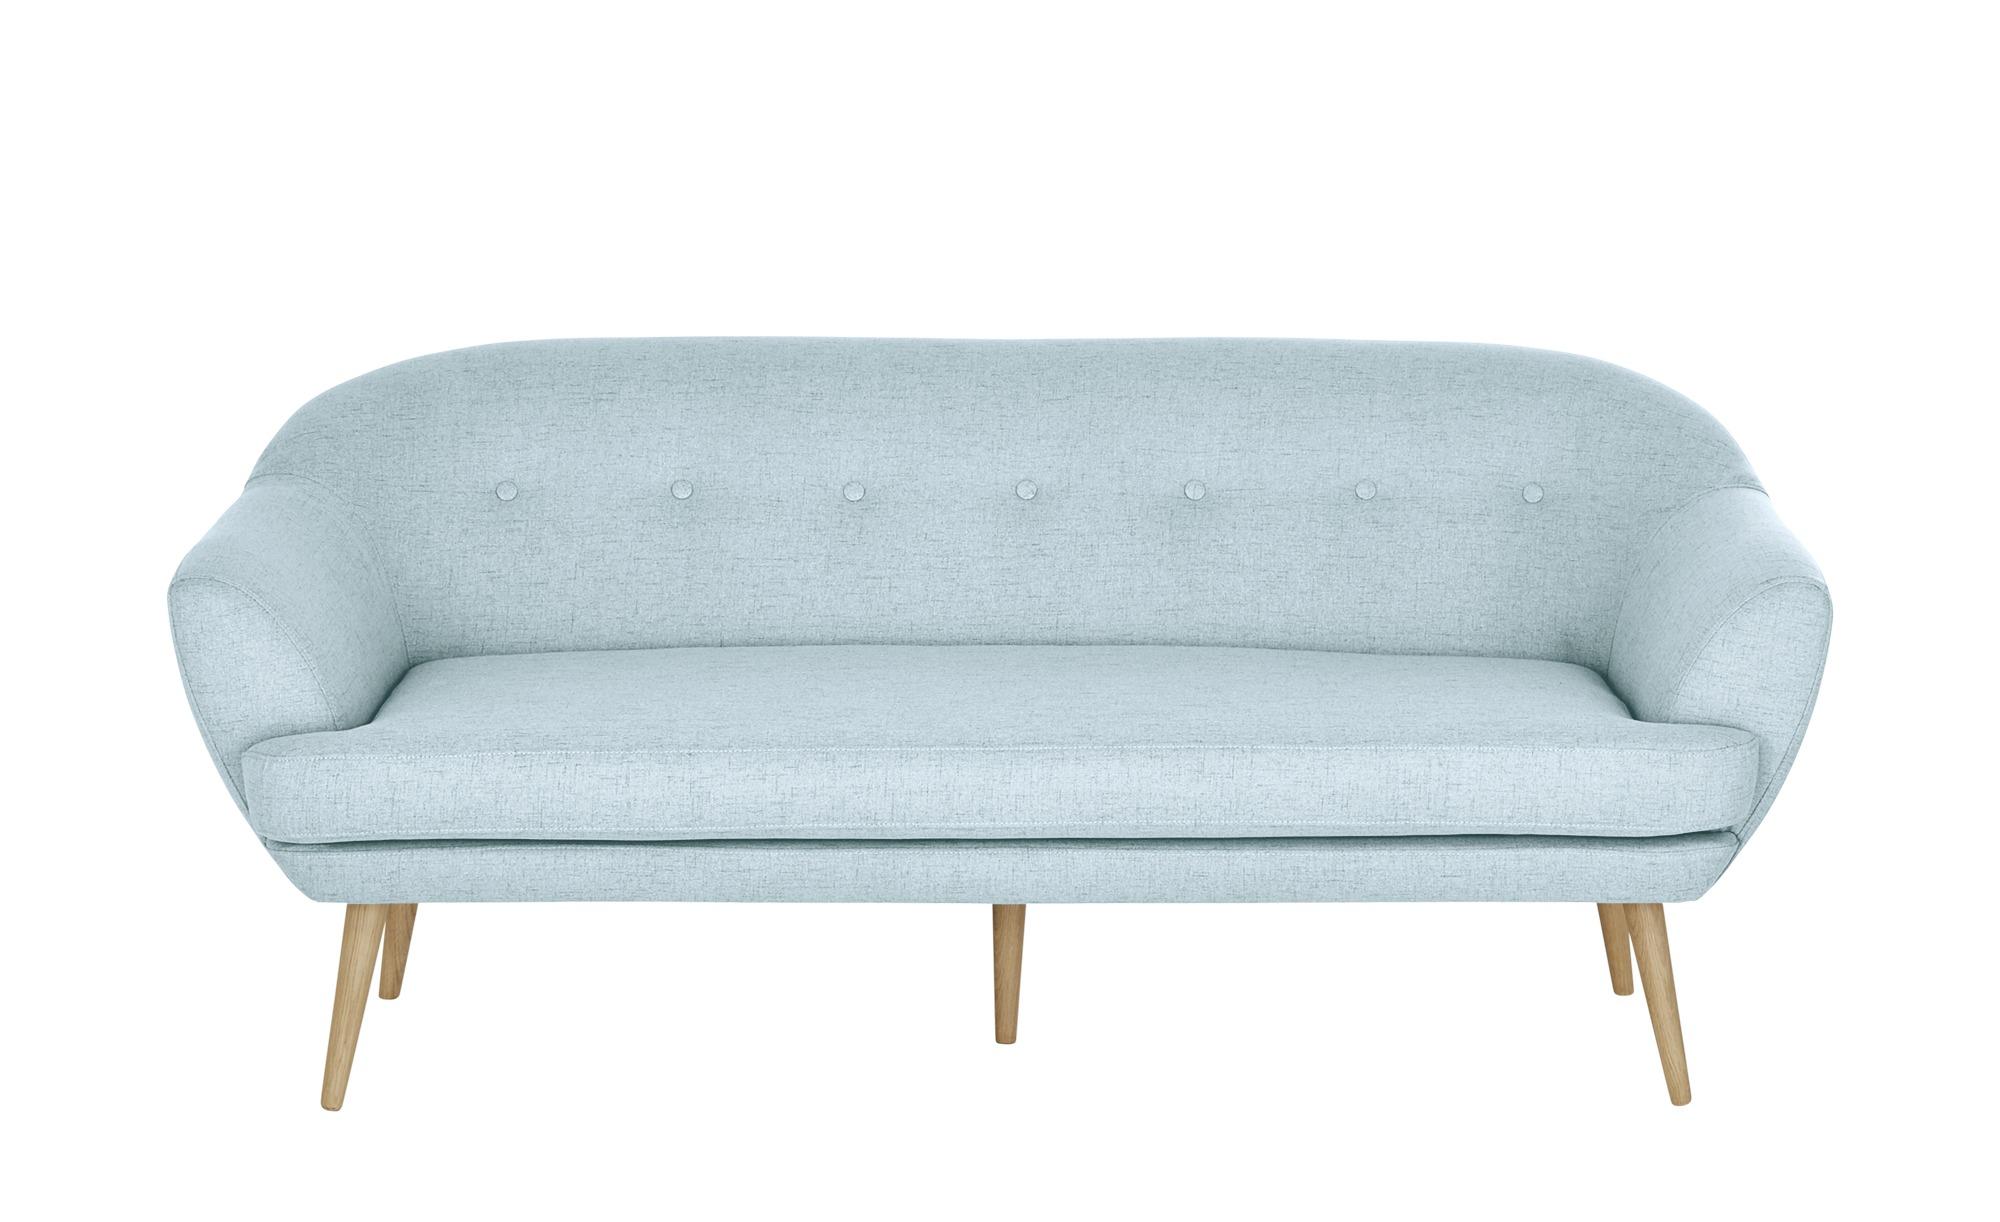 finya Sofa hellblau - Webstoff Elsa ¦ Maße (cm): B: 185 H: 77 T: 88 Polstermöbel > Sofas > 3-Sitzer - Höffner